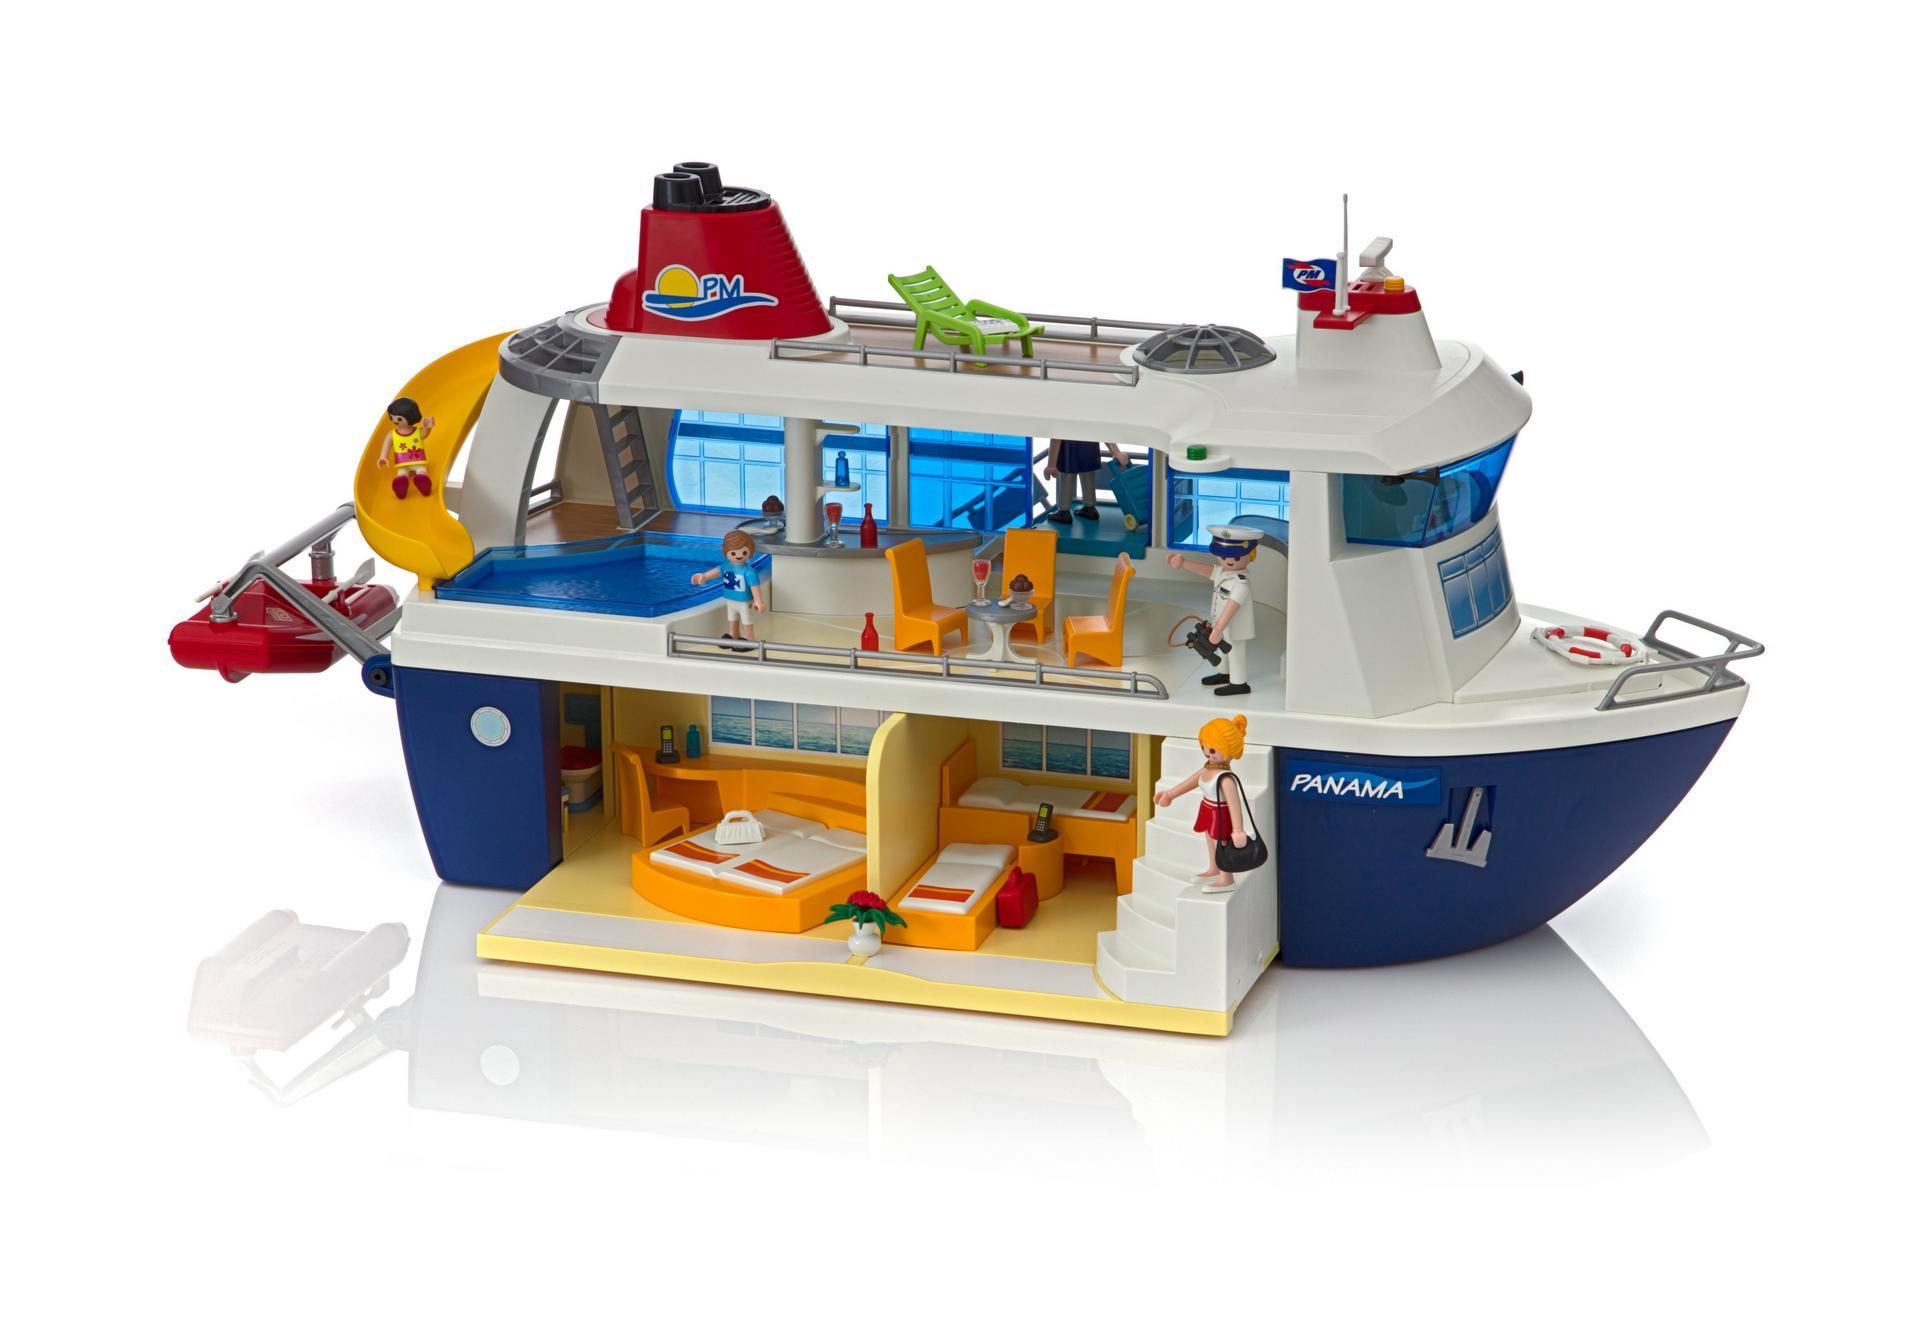 Playmobil Campingplatz Ausmalbilder : Cruise Ship 6978 Playmobil United Kingdom